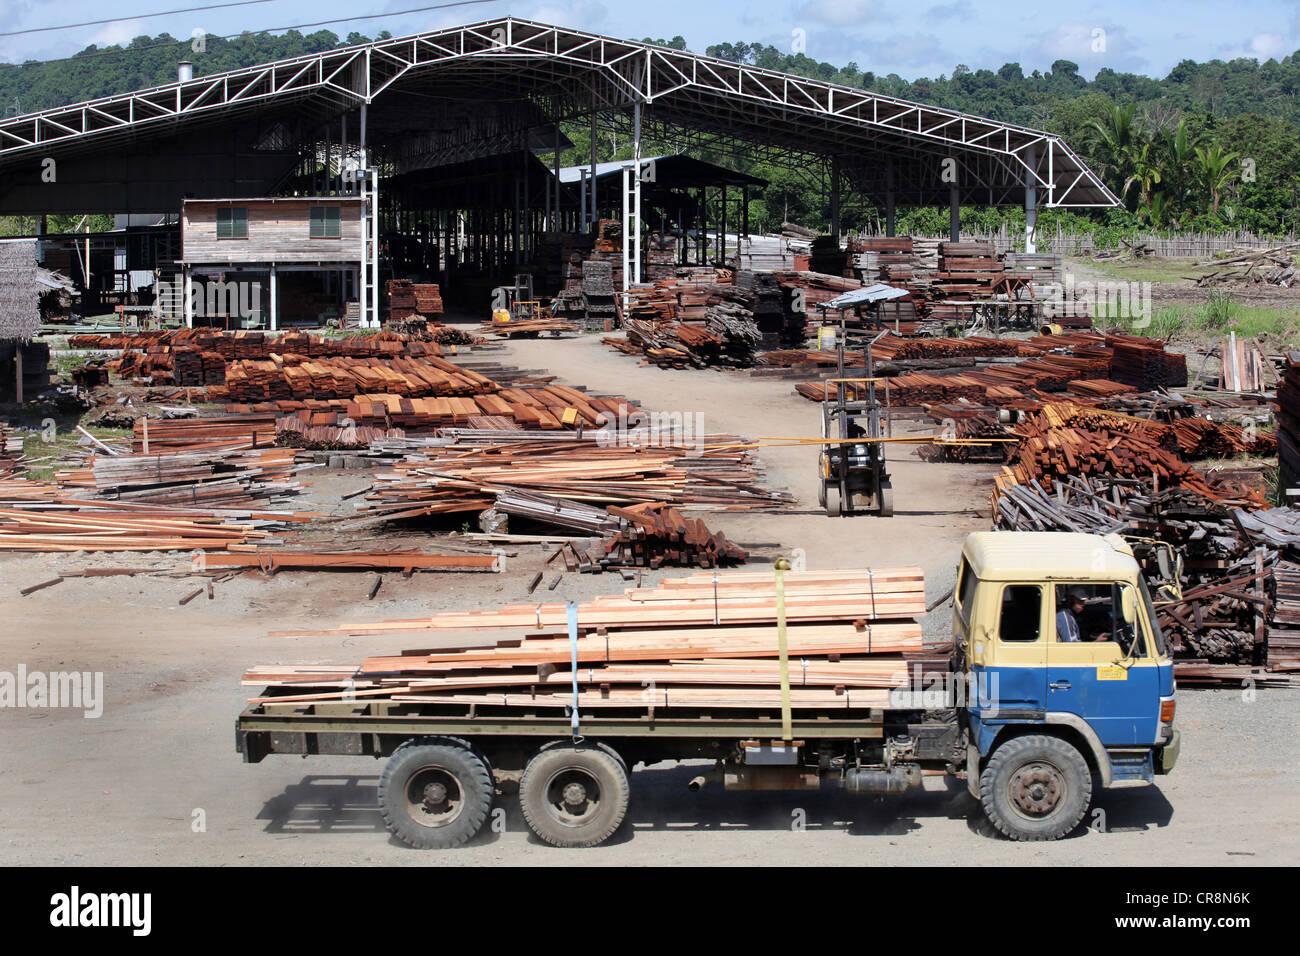 La fábrica de procesamiento de madera de aserradero, Santi Silvicultura, Madang, Papua Neuguinea Imagen De Stock